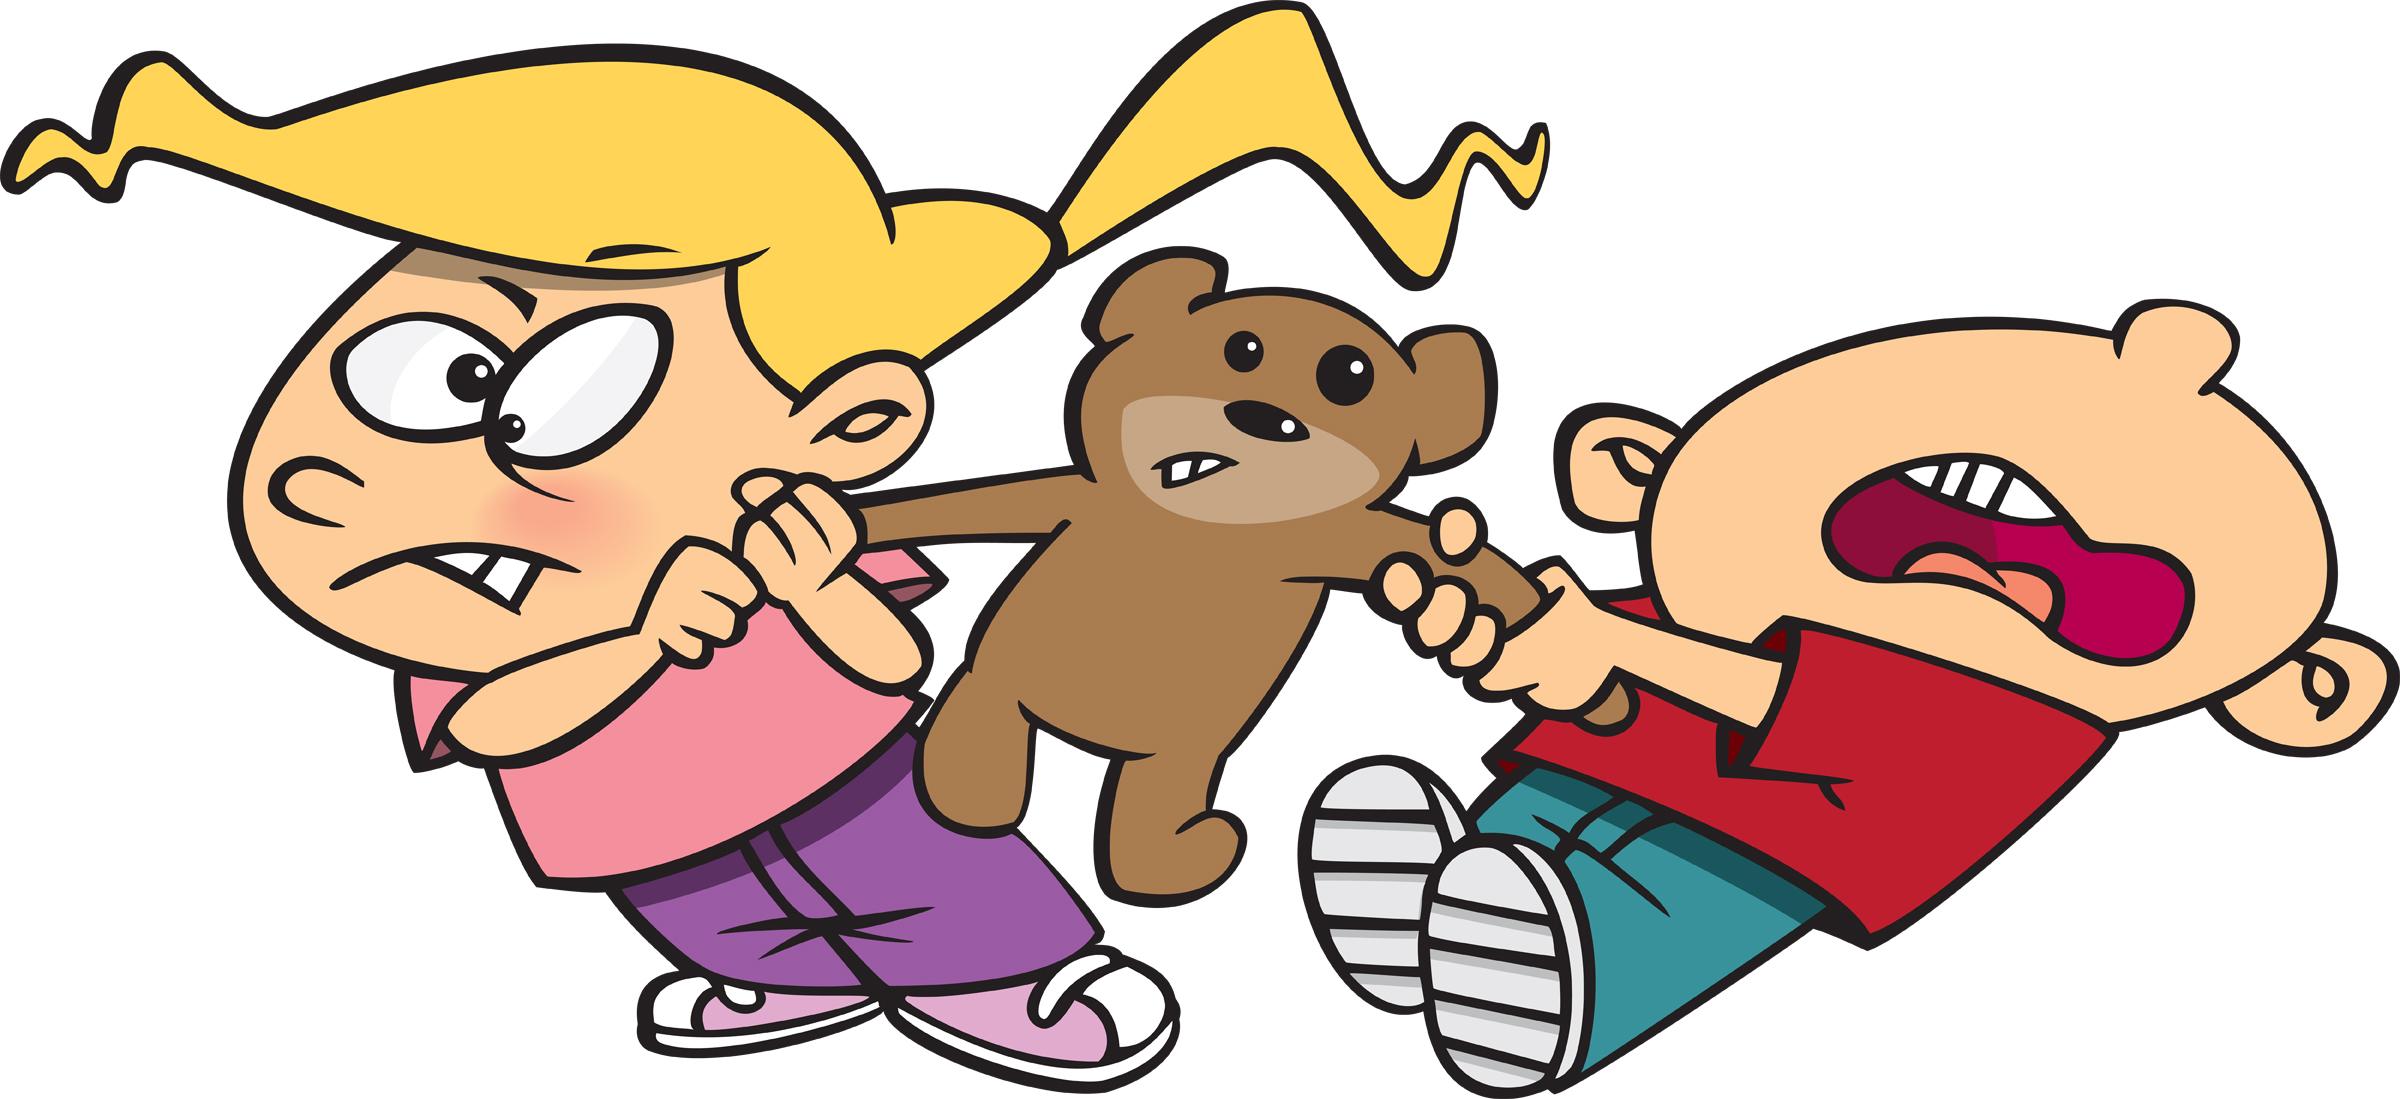 Clipart kids sharing free download Free Sharing Cliparts, Download Free Clip Art, Free Clip Art on ... free download